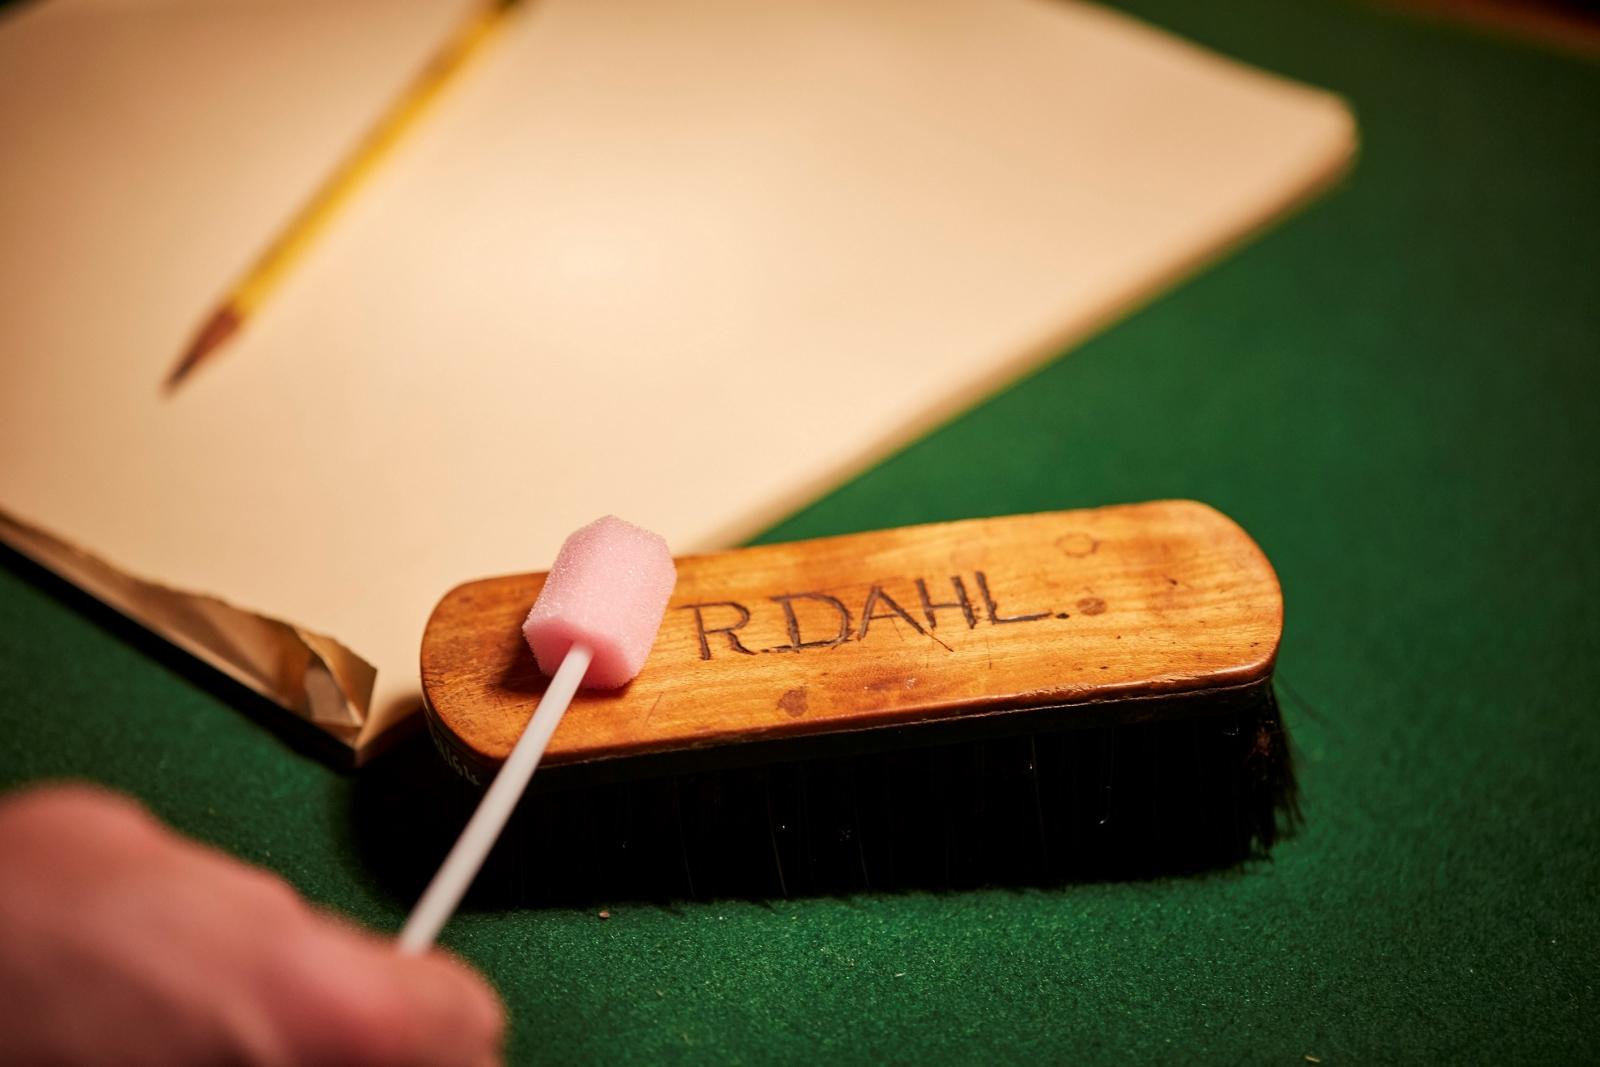 Swabbing Roald Dahl's chair for yeast cultures